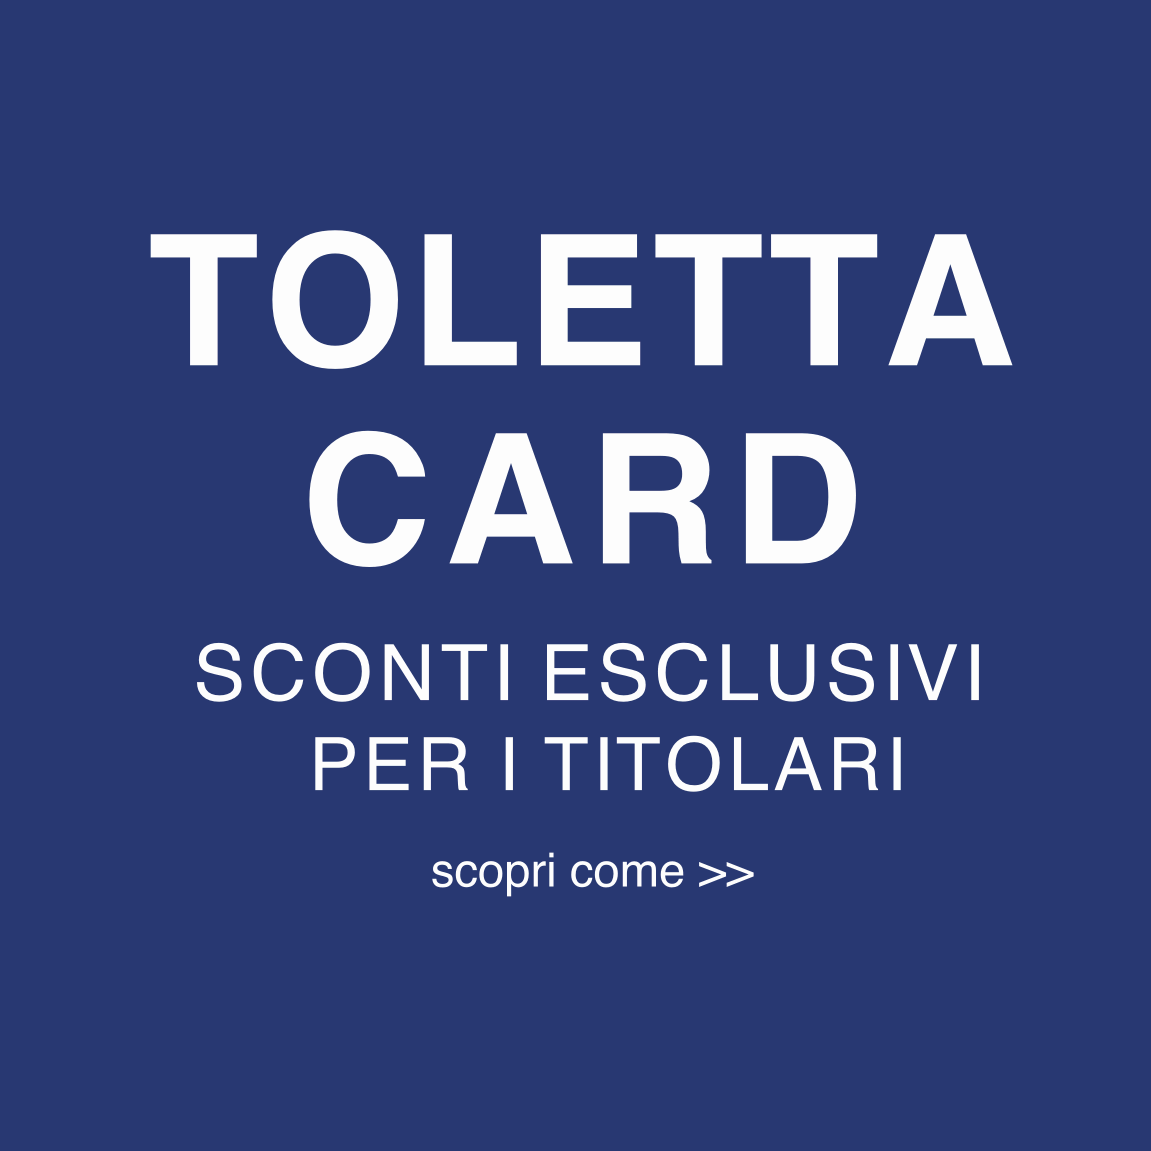 toletta card 2